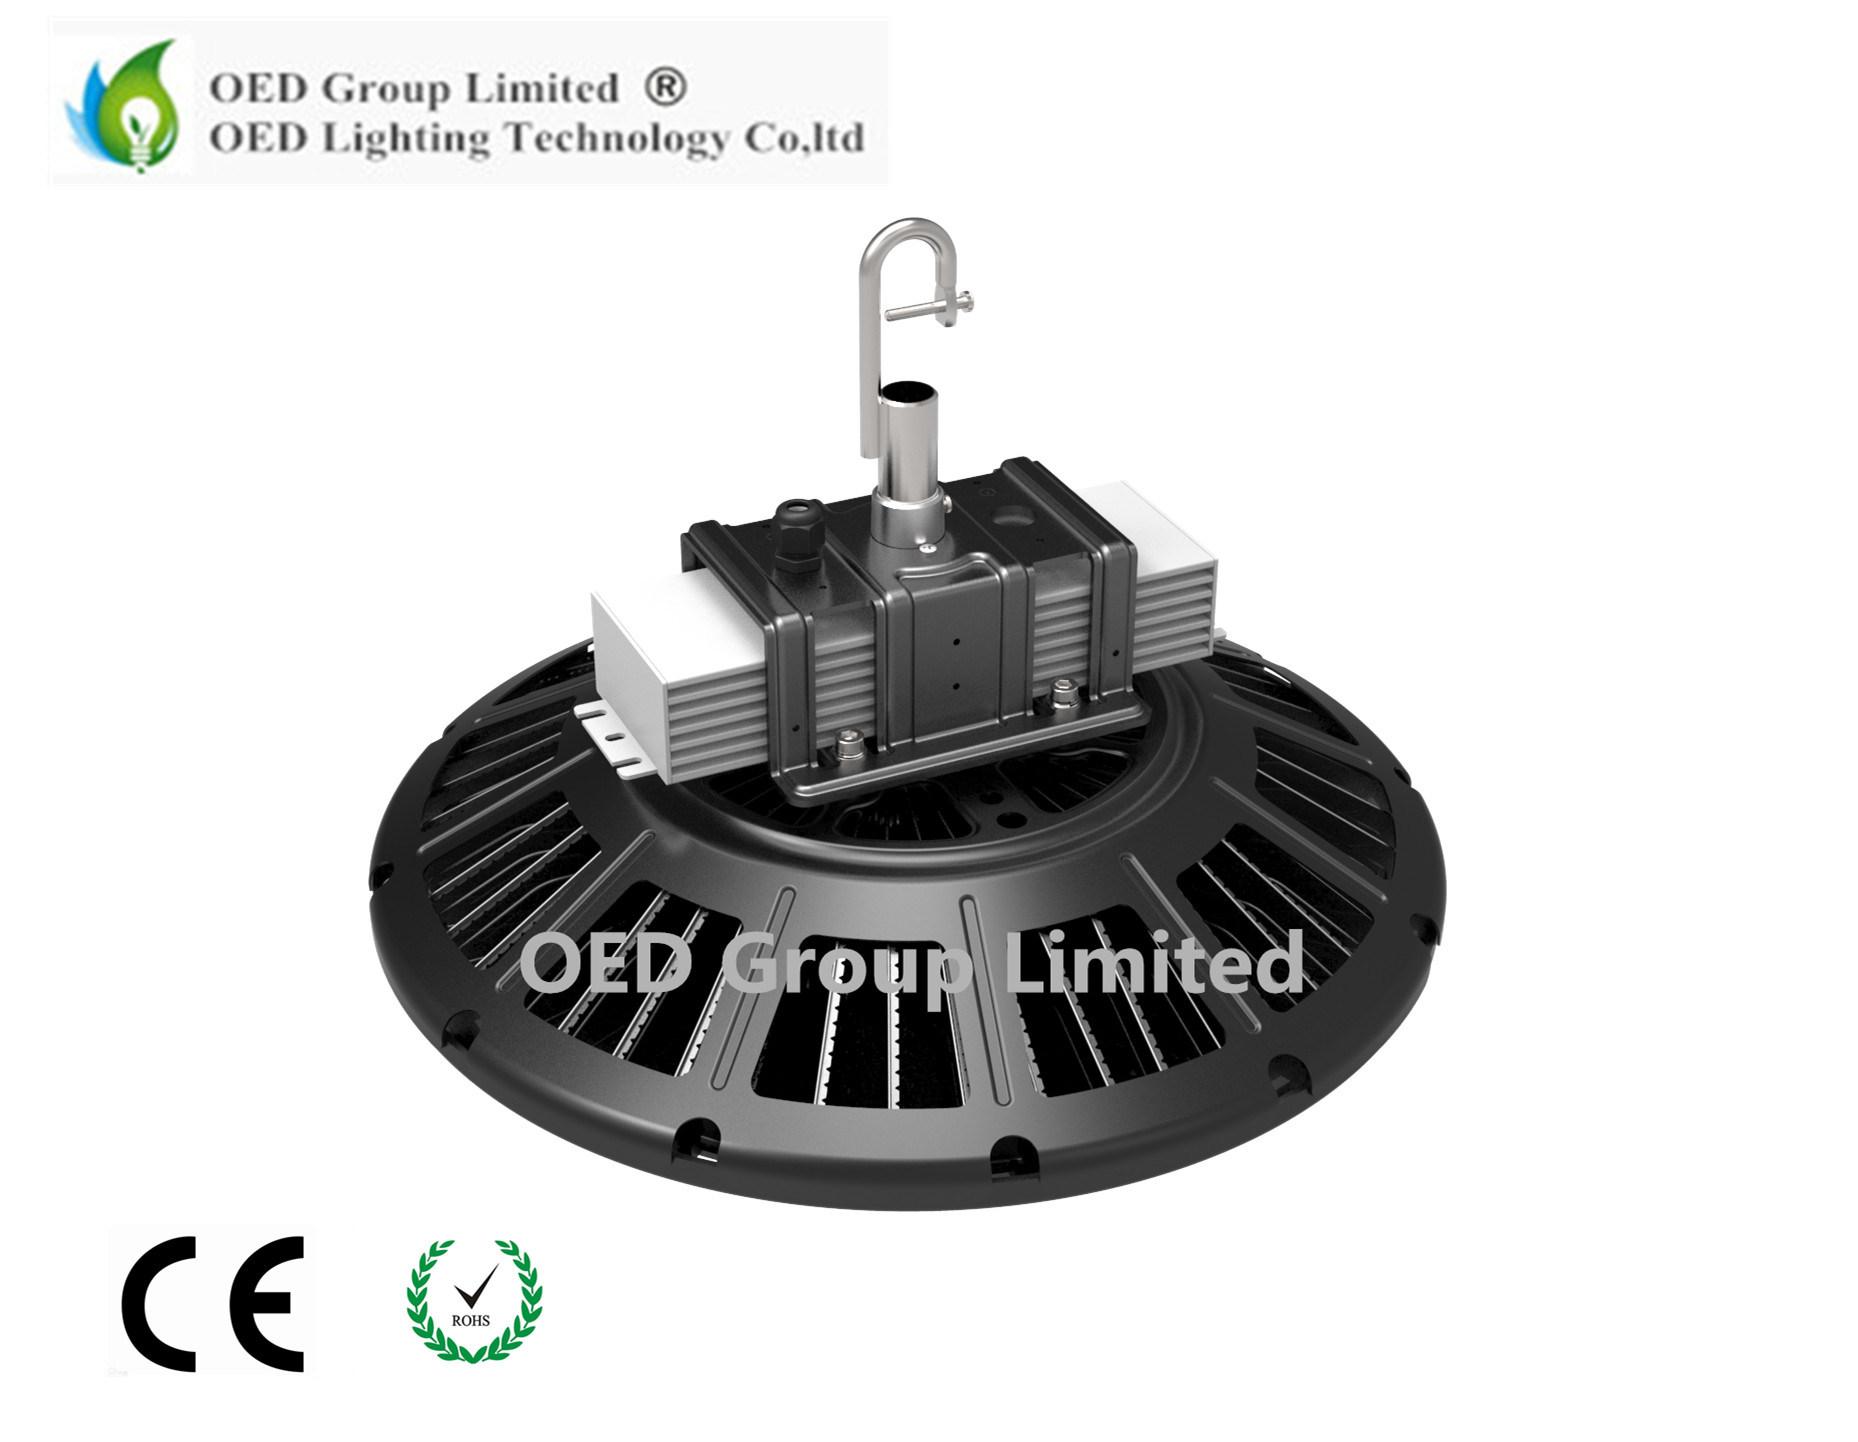 Hot Sale High Lumen E39 E40 UFO LED High Bay Light 200W Industrial Light with PC Lens